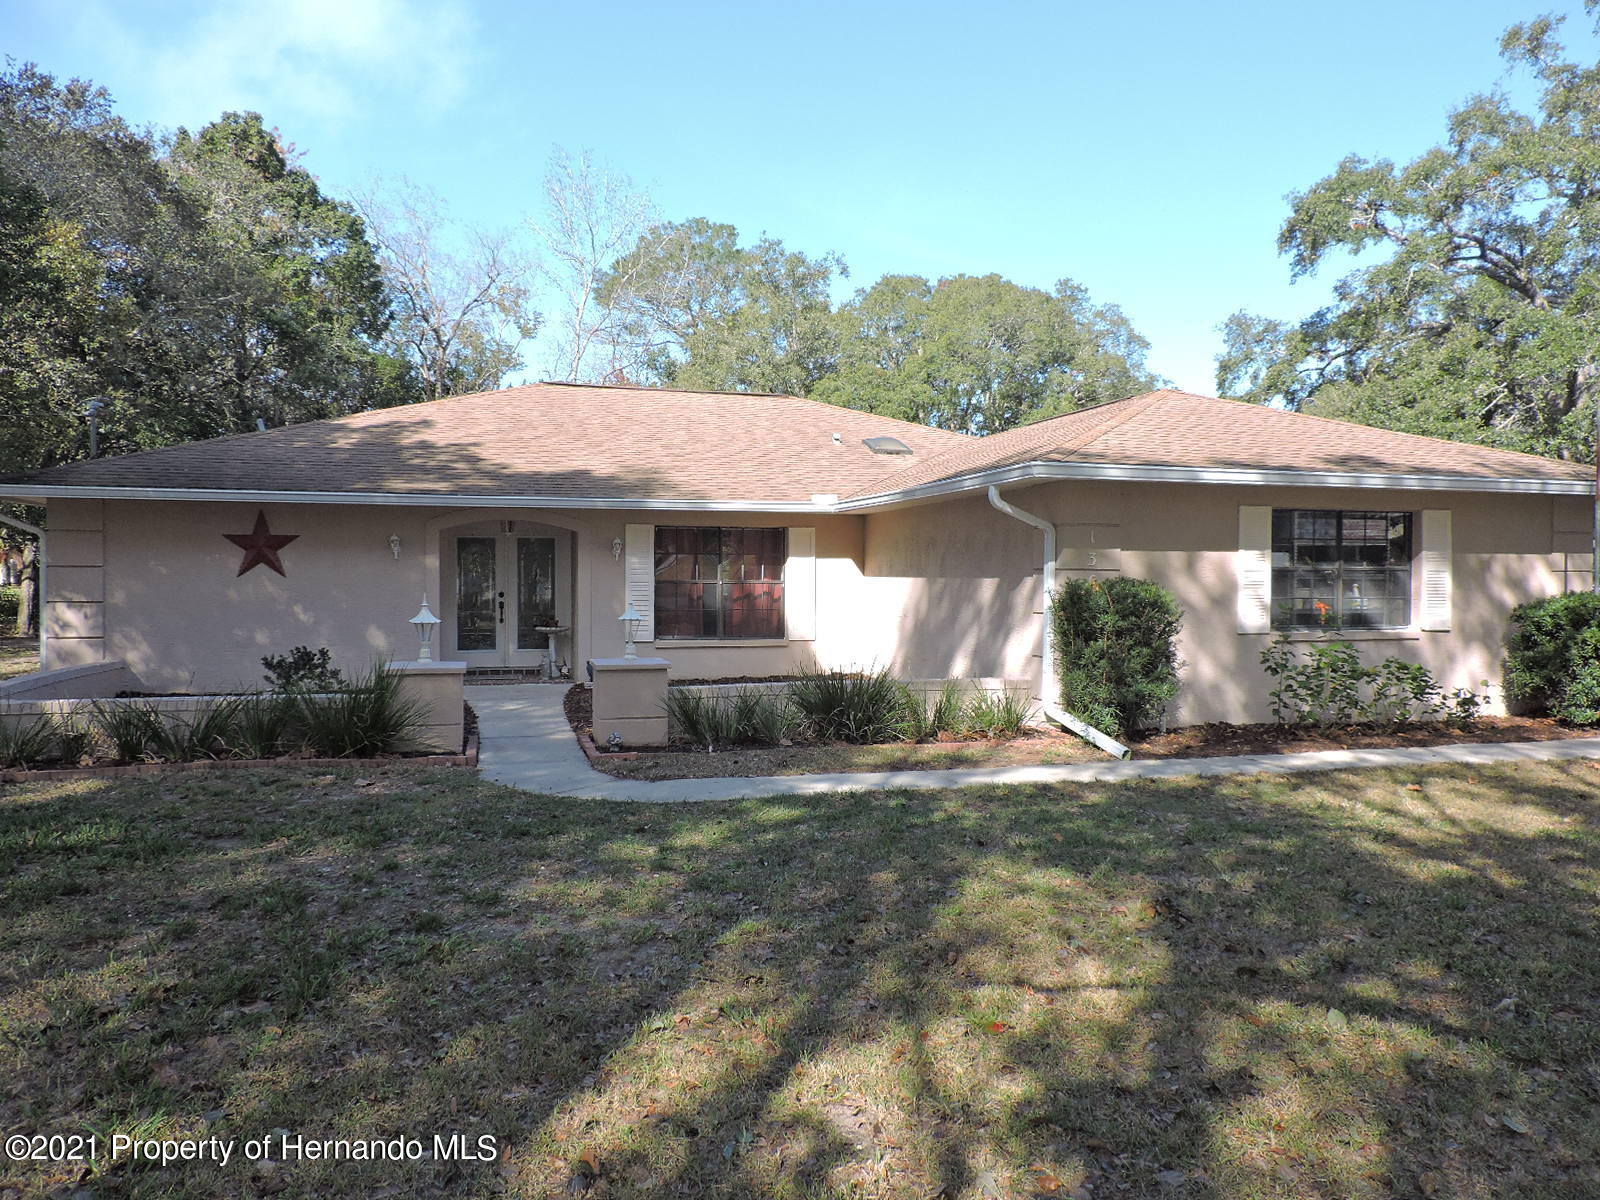 Details for 1369 Barranca Avenue, Spring Hill, FL 34609